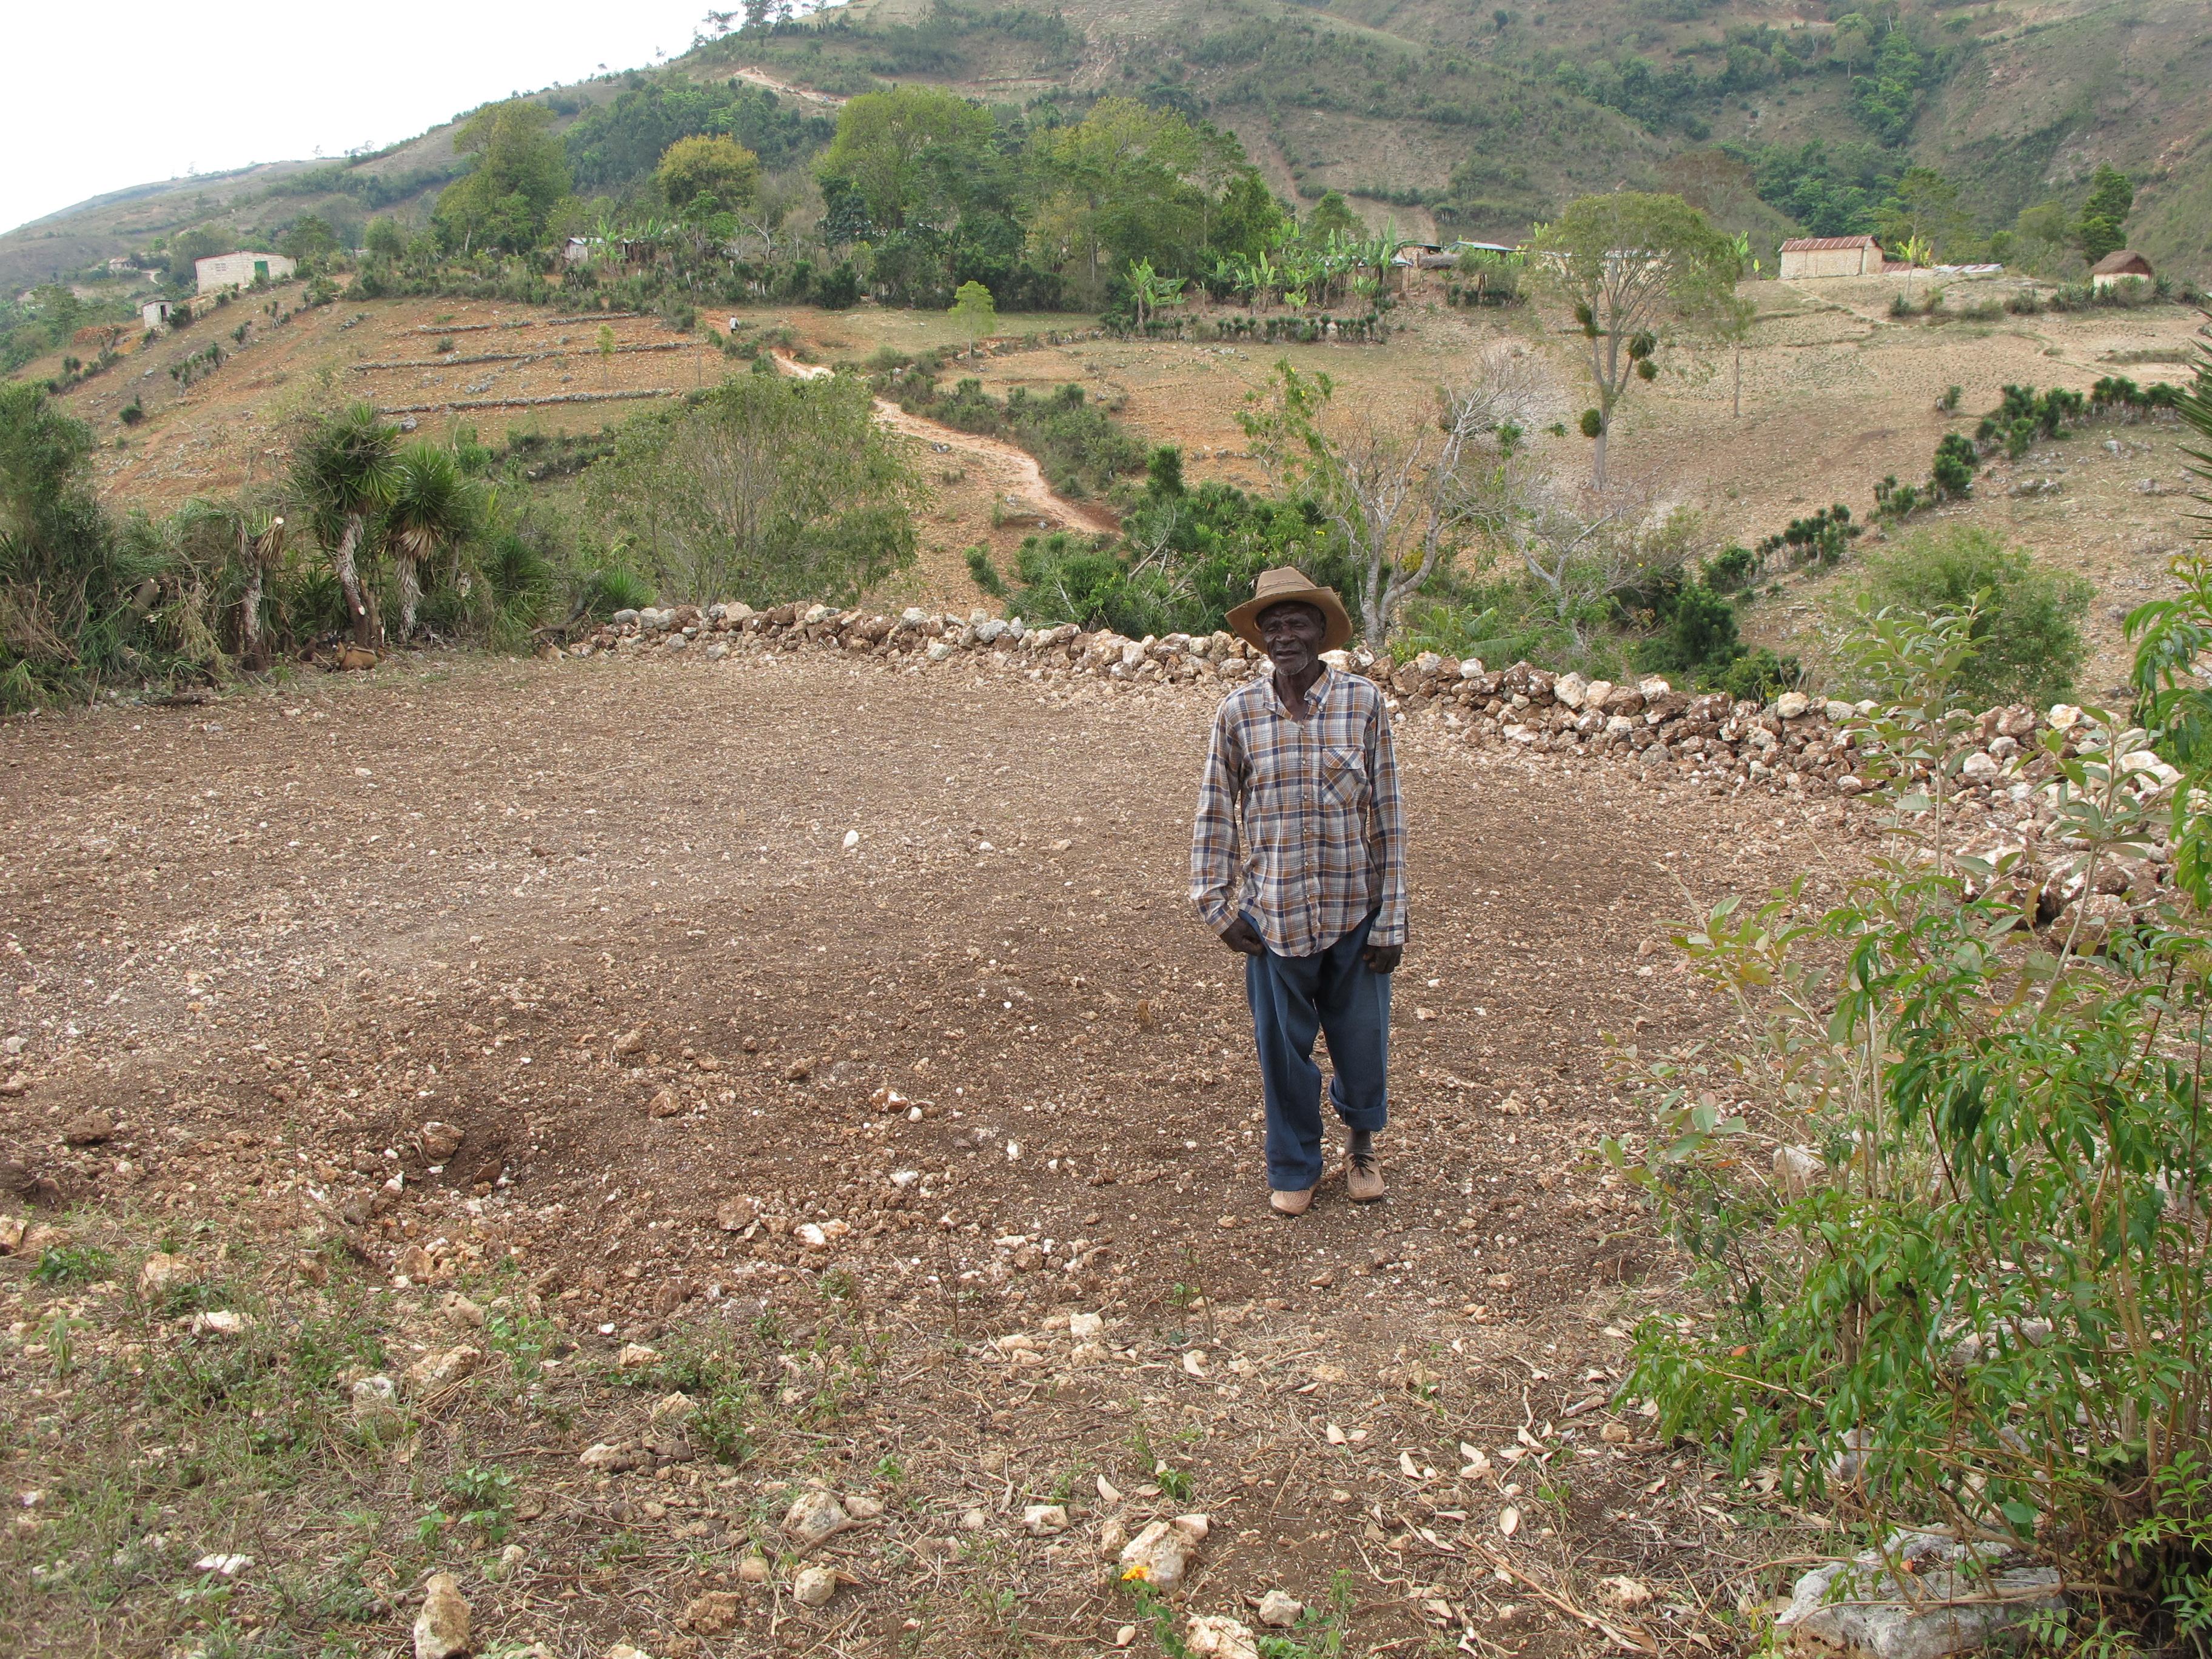 Poppy standing on land in Pelerin he hopes a church will be built on.